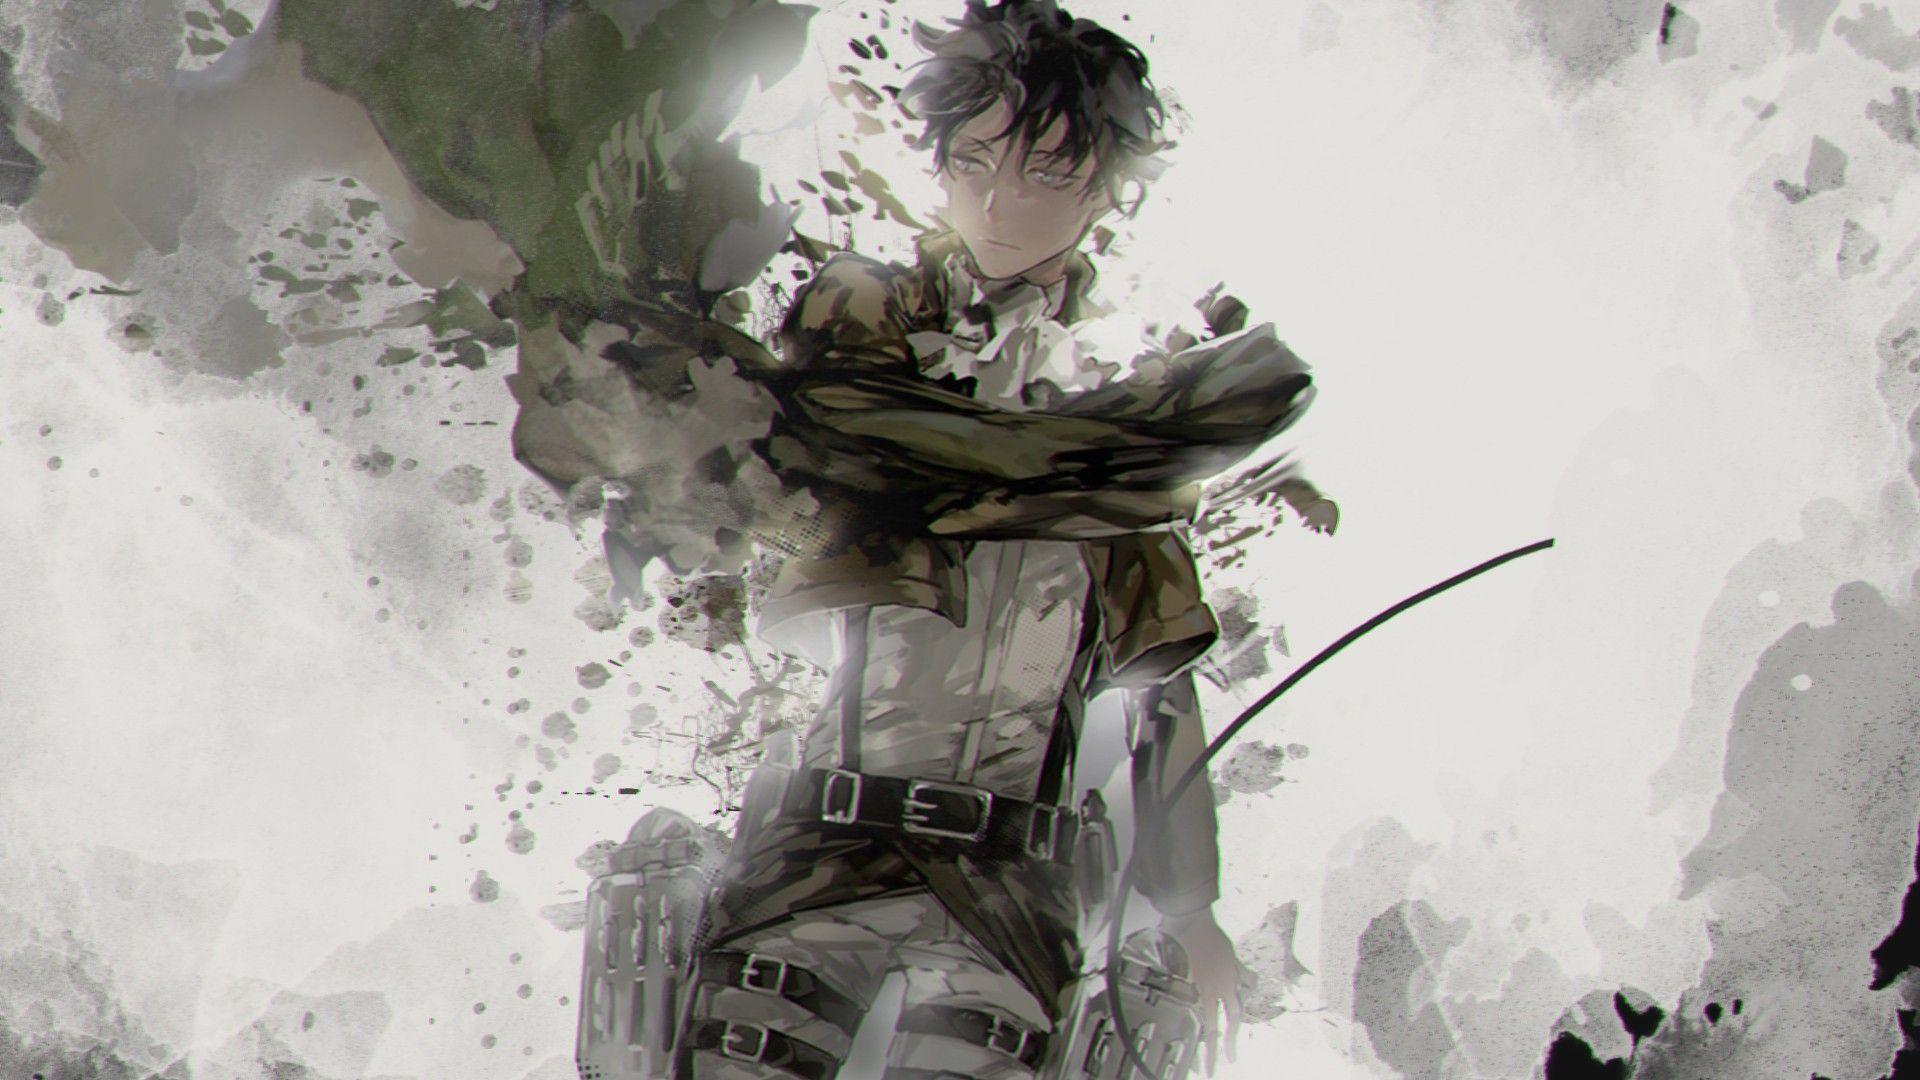 Pin By Evelyn Ackerman On Levi Ackerman Snk Anime Guys Shirtless Levi Ackerman Attack On Titan